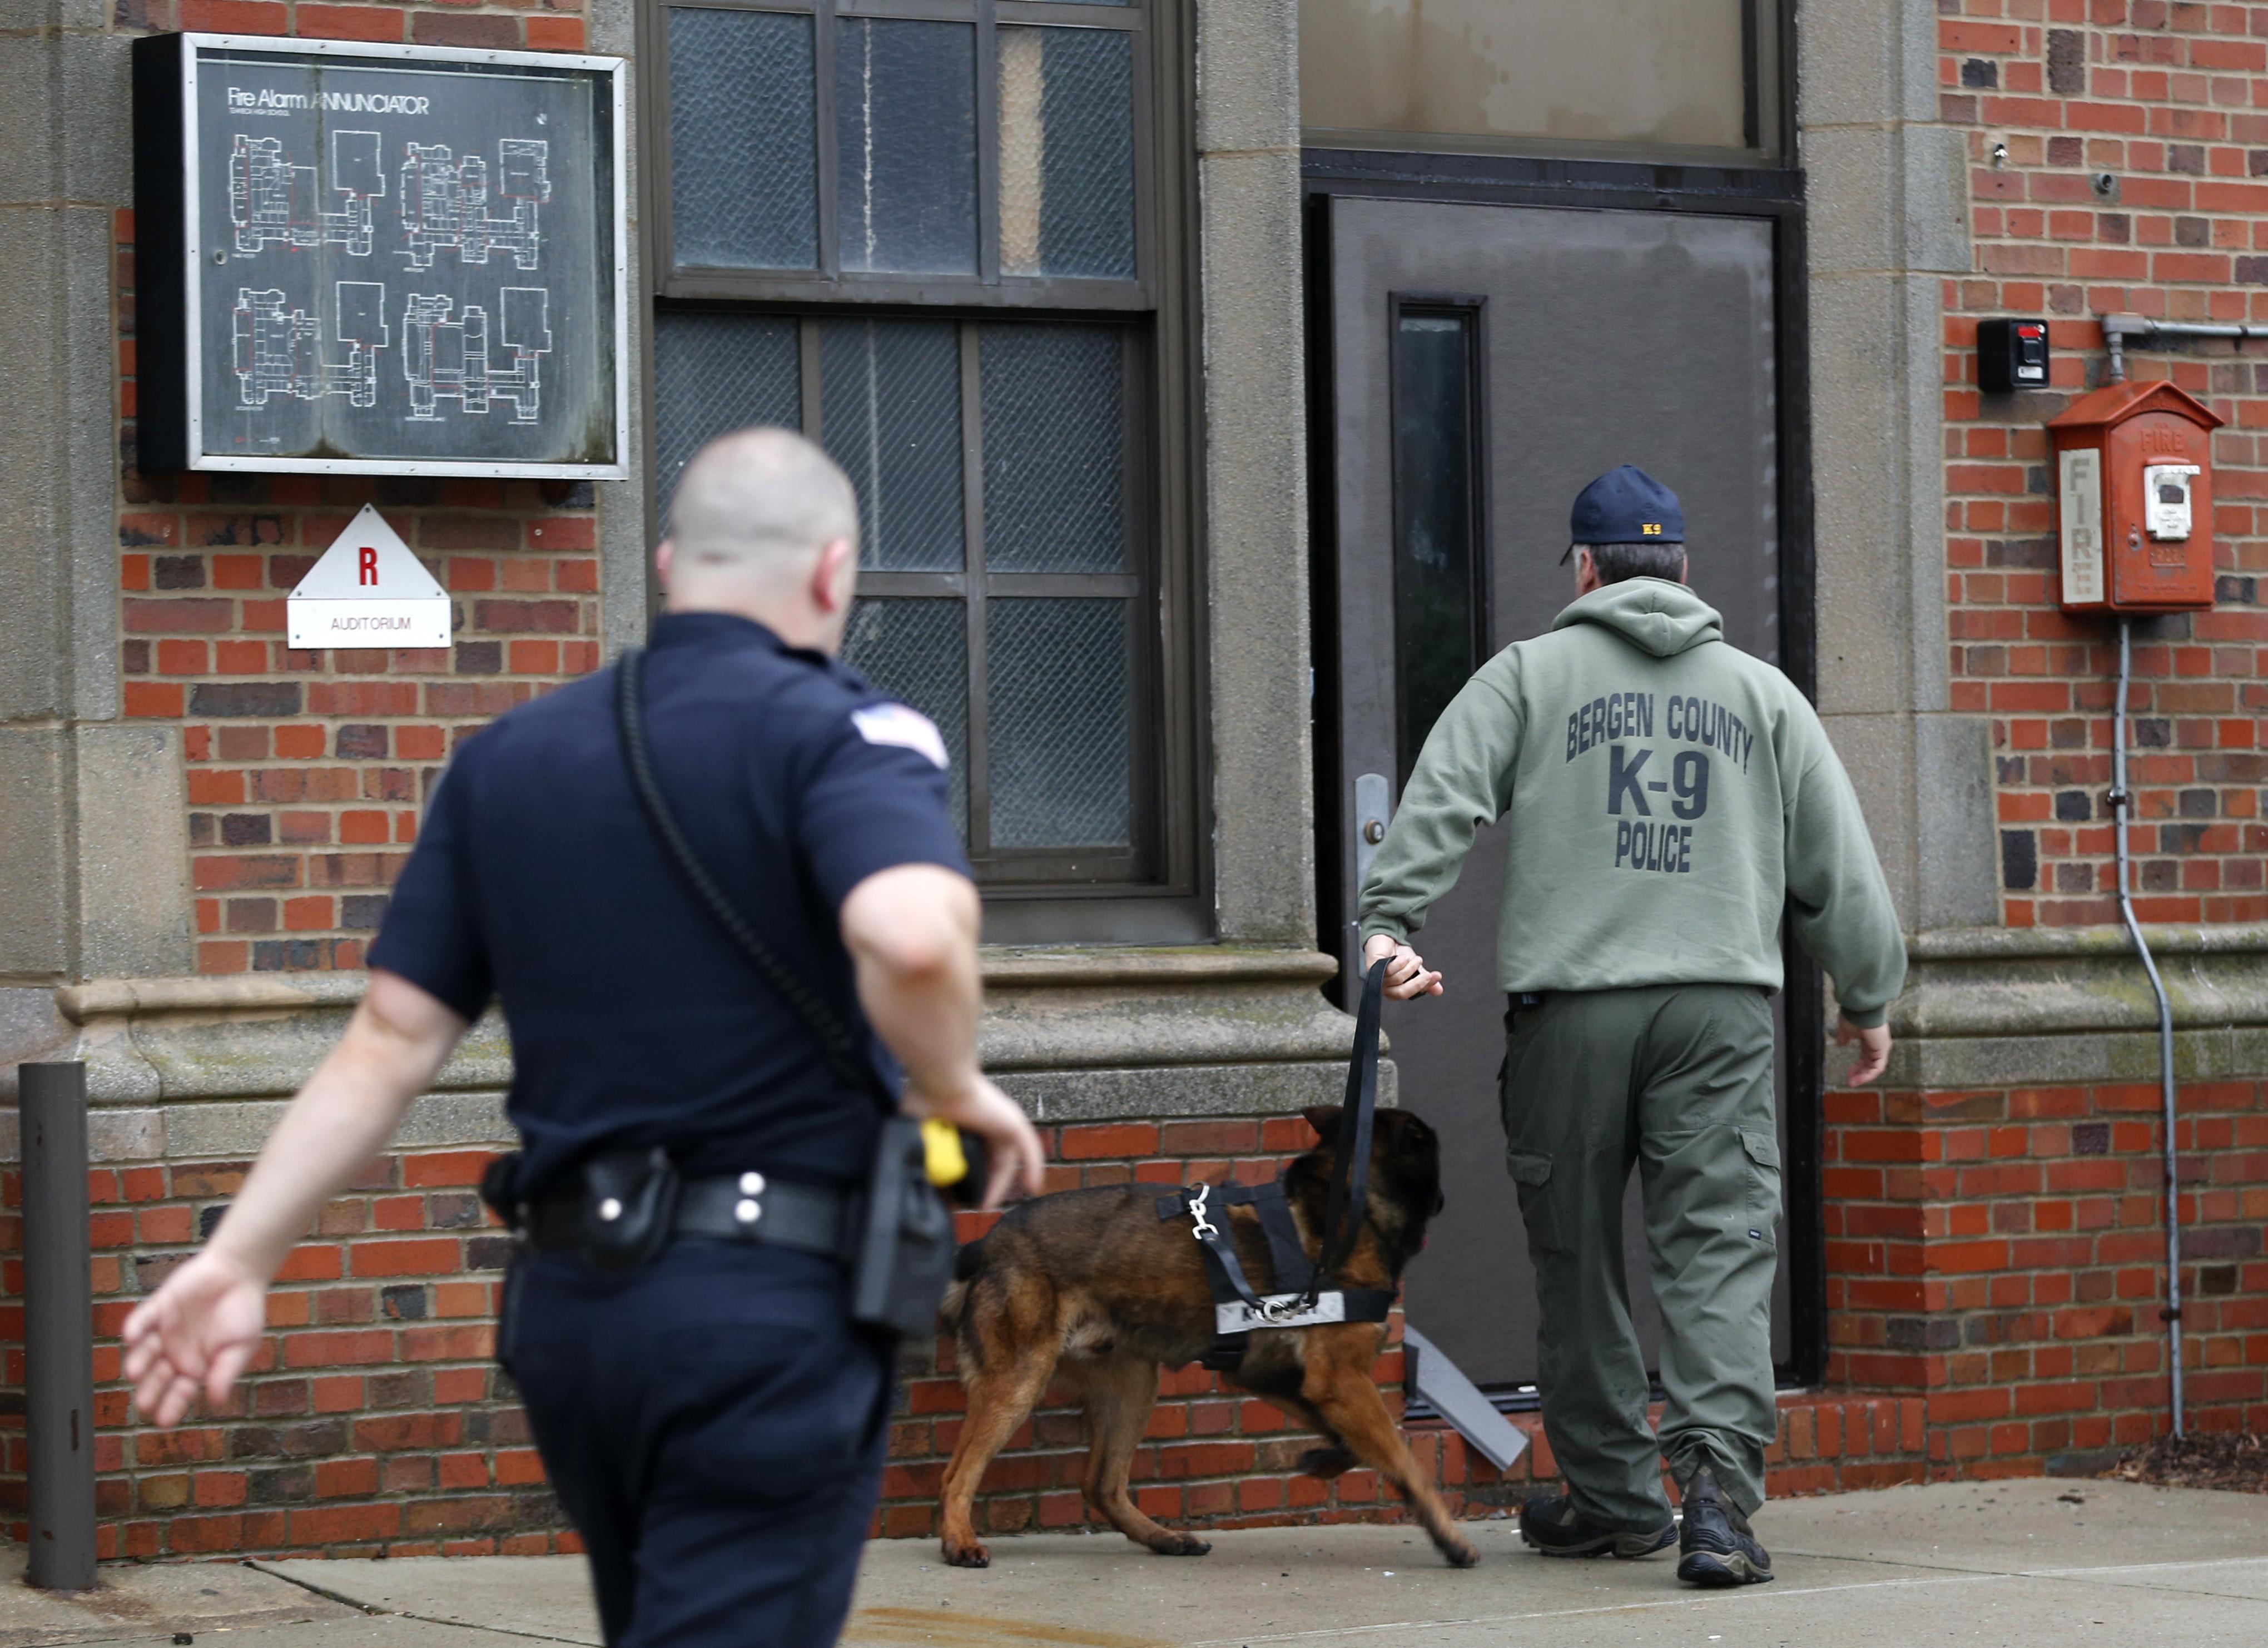 Senior Prank Gone Wild: Police Arrest 62 N.J. Students